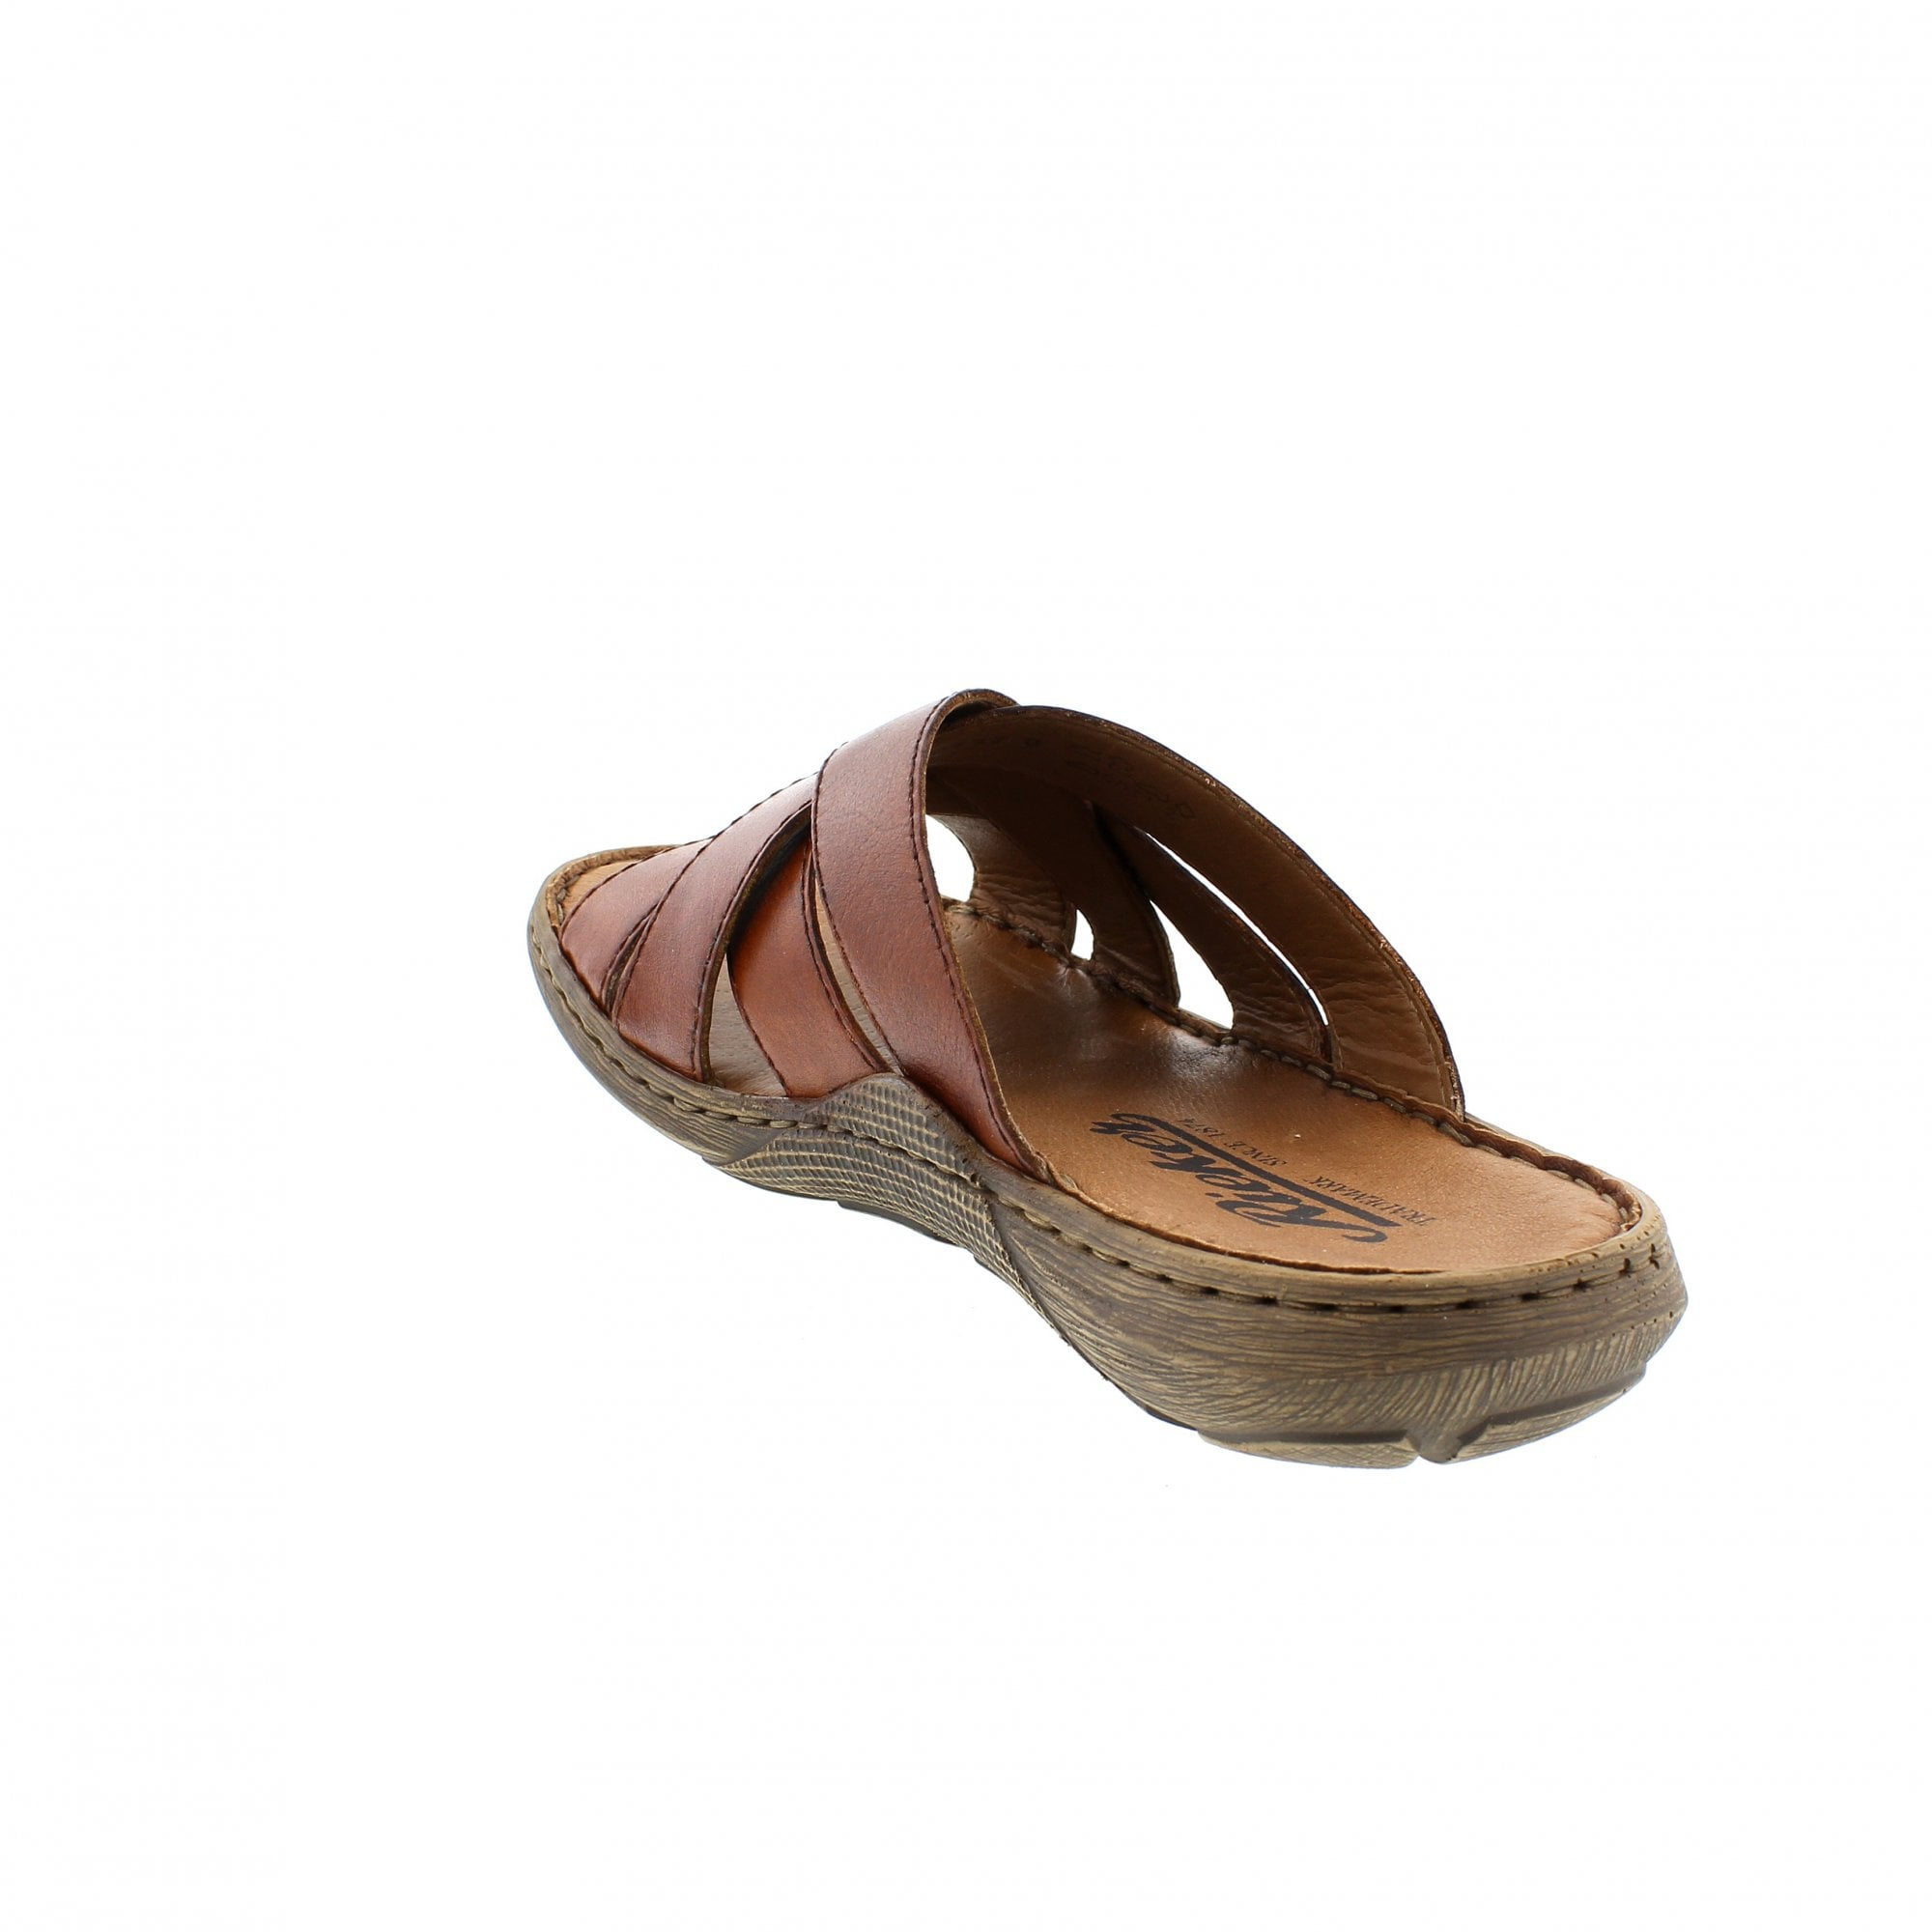 2cf82a1ccf4e Rieker 22098-24 Tan Leather Mens Mule Sandals